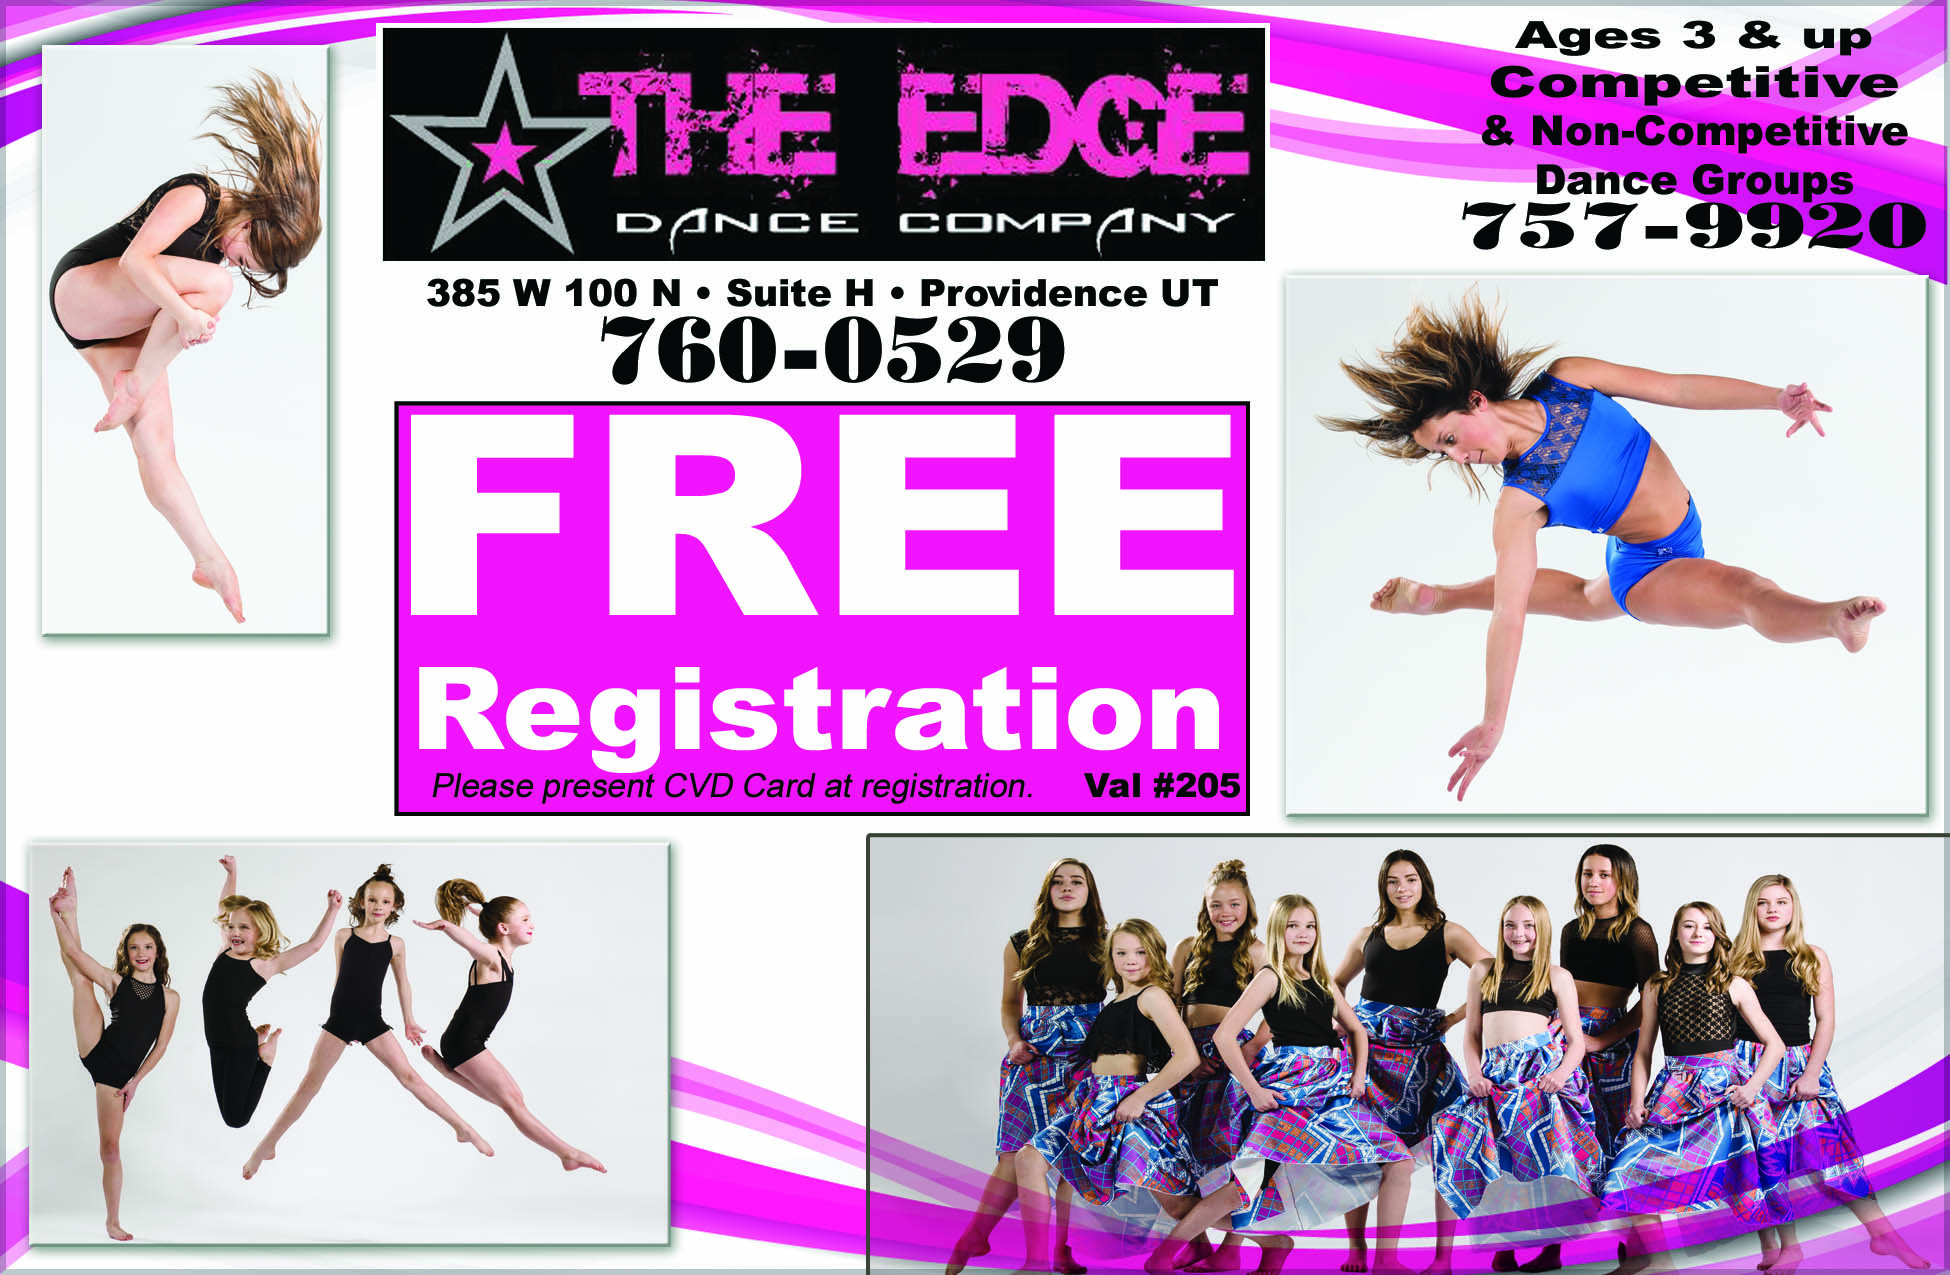 The Edge Dance Company